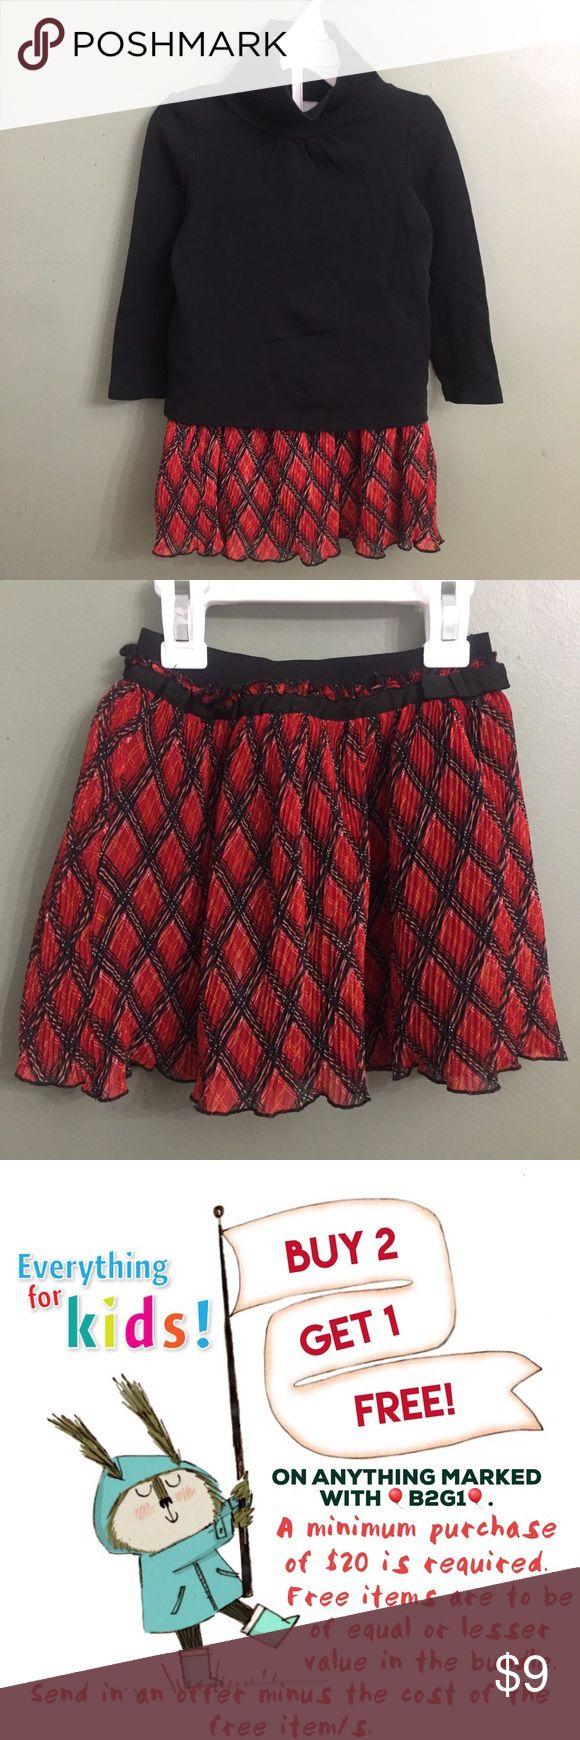 EUC Circo Turtleneck & Kids R Us Skirt Outfit, 3T EUC Circo Turtleneck & Kids R Us Skirt Outfit, 3T🎈B2G1🎈 Matching Sets